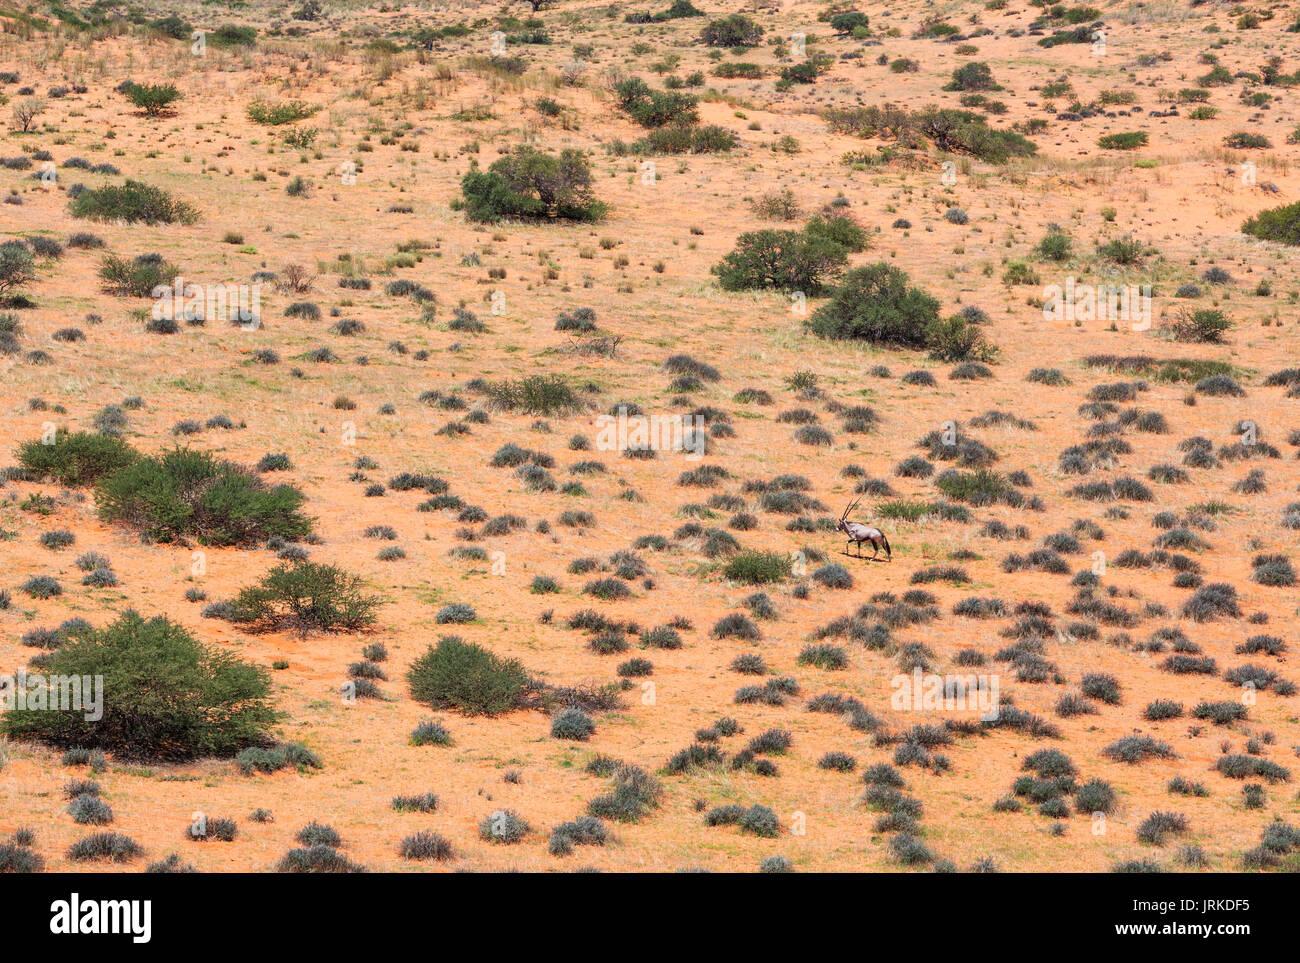 Gemsbok (Oryx gazella) in the vast Kalahari Desert, rainy season with some green grass, Kgalagadi Transfrontier Stock Photo